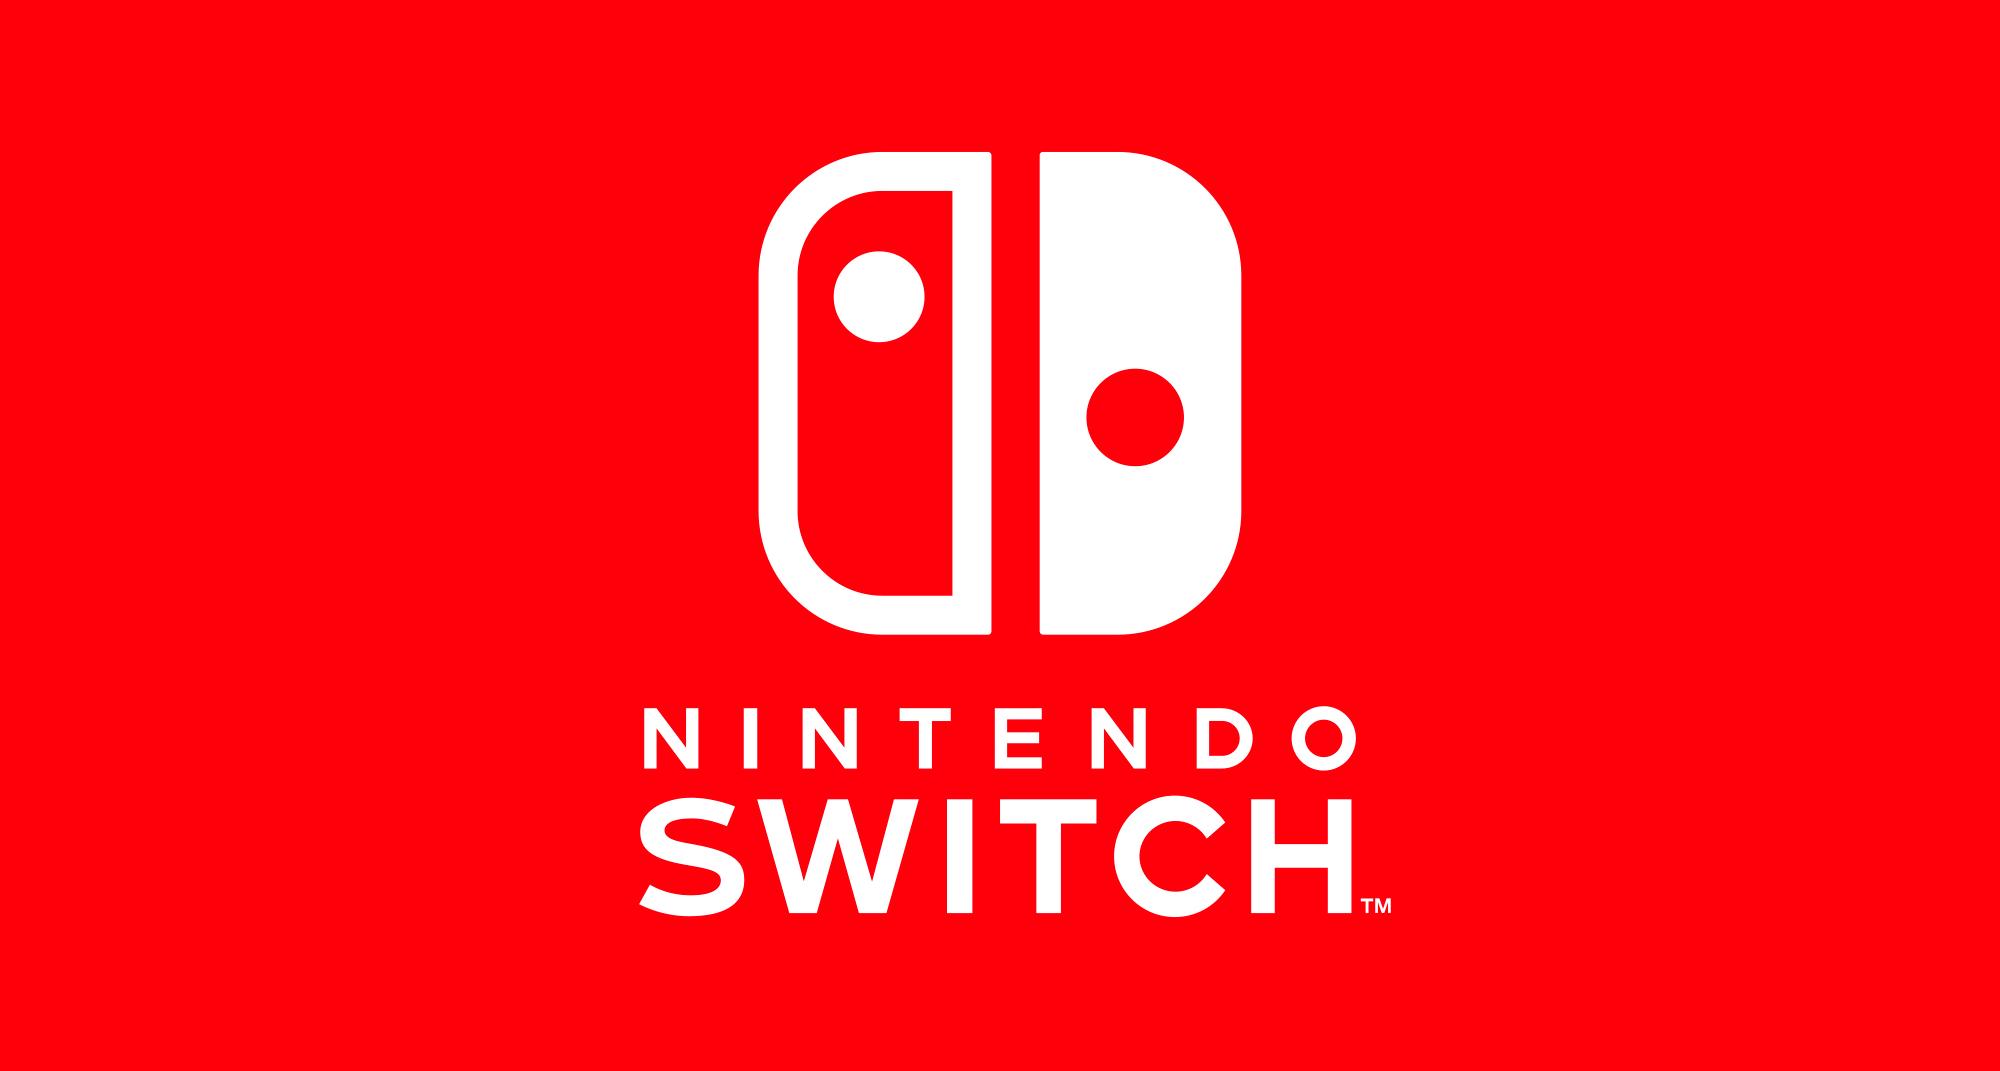 Image result for nintendo logo 4k pic